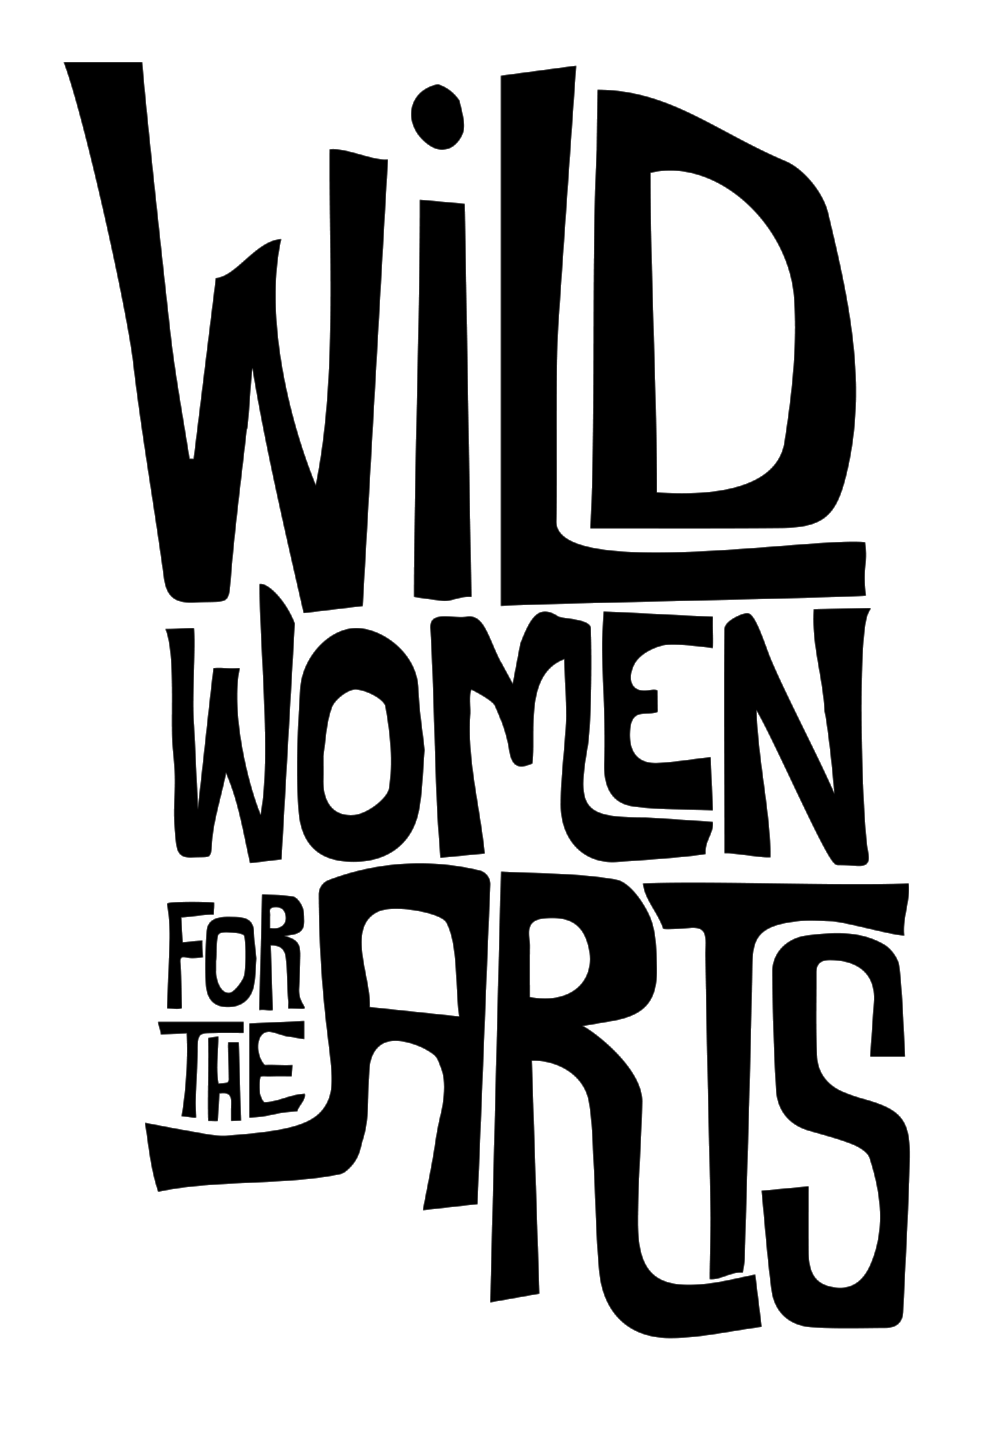 ww logo 2017-01.png